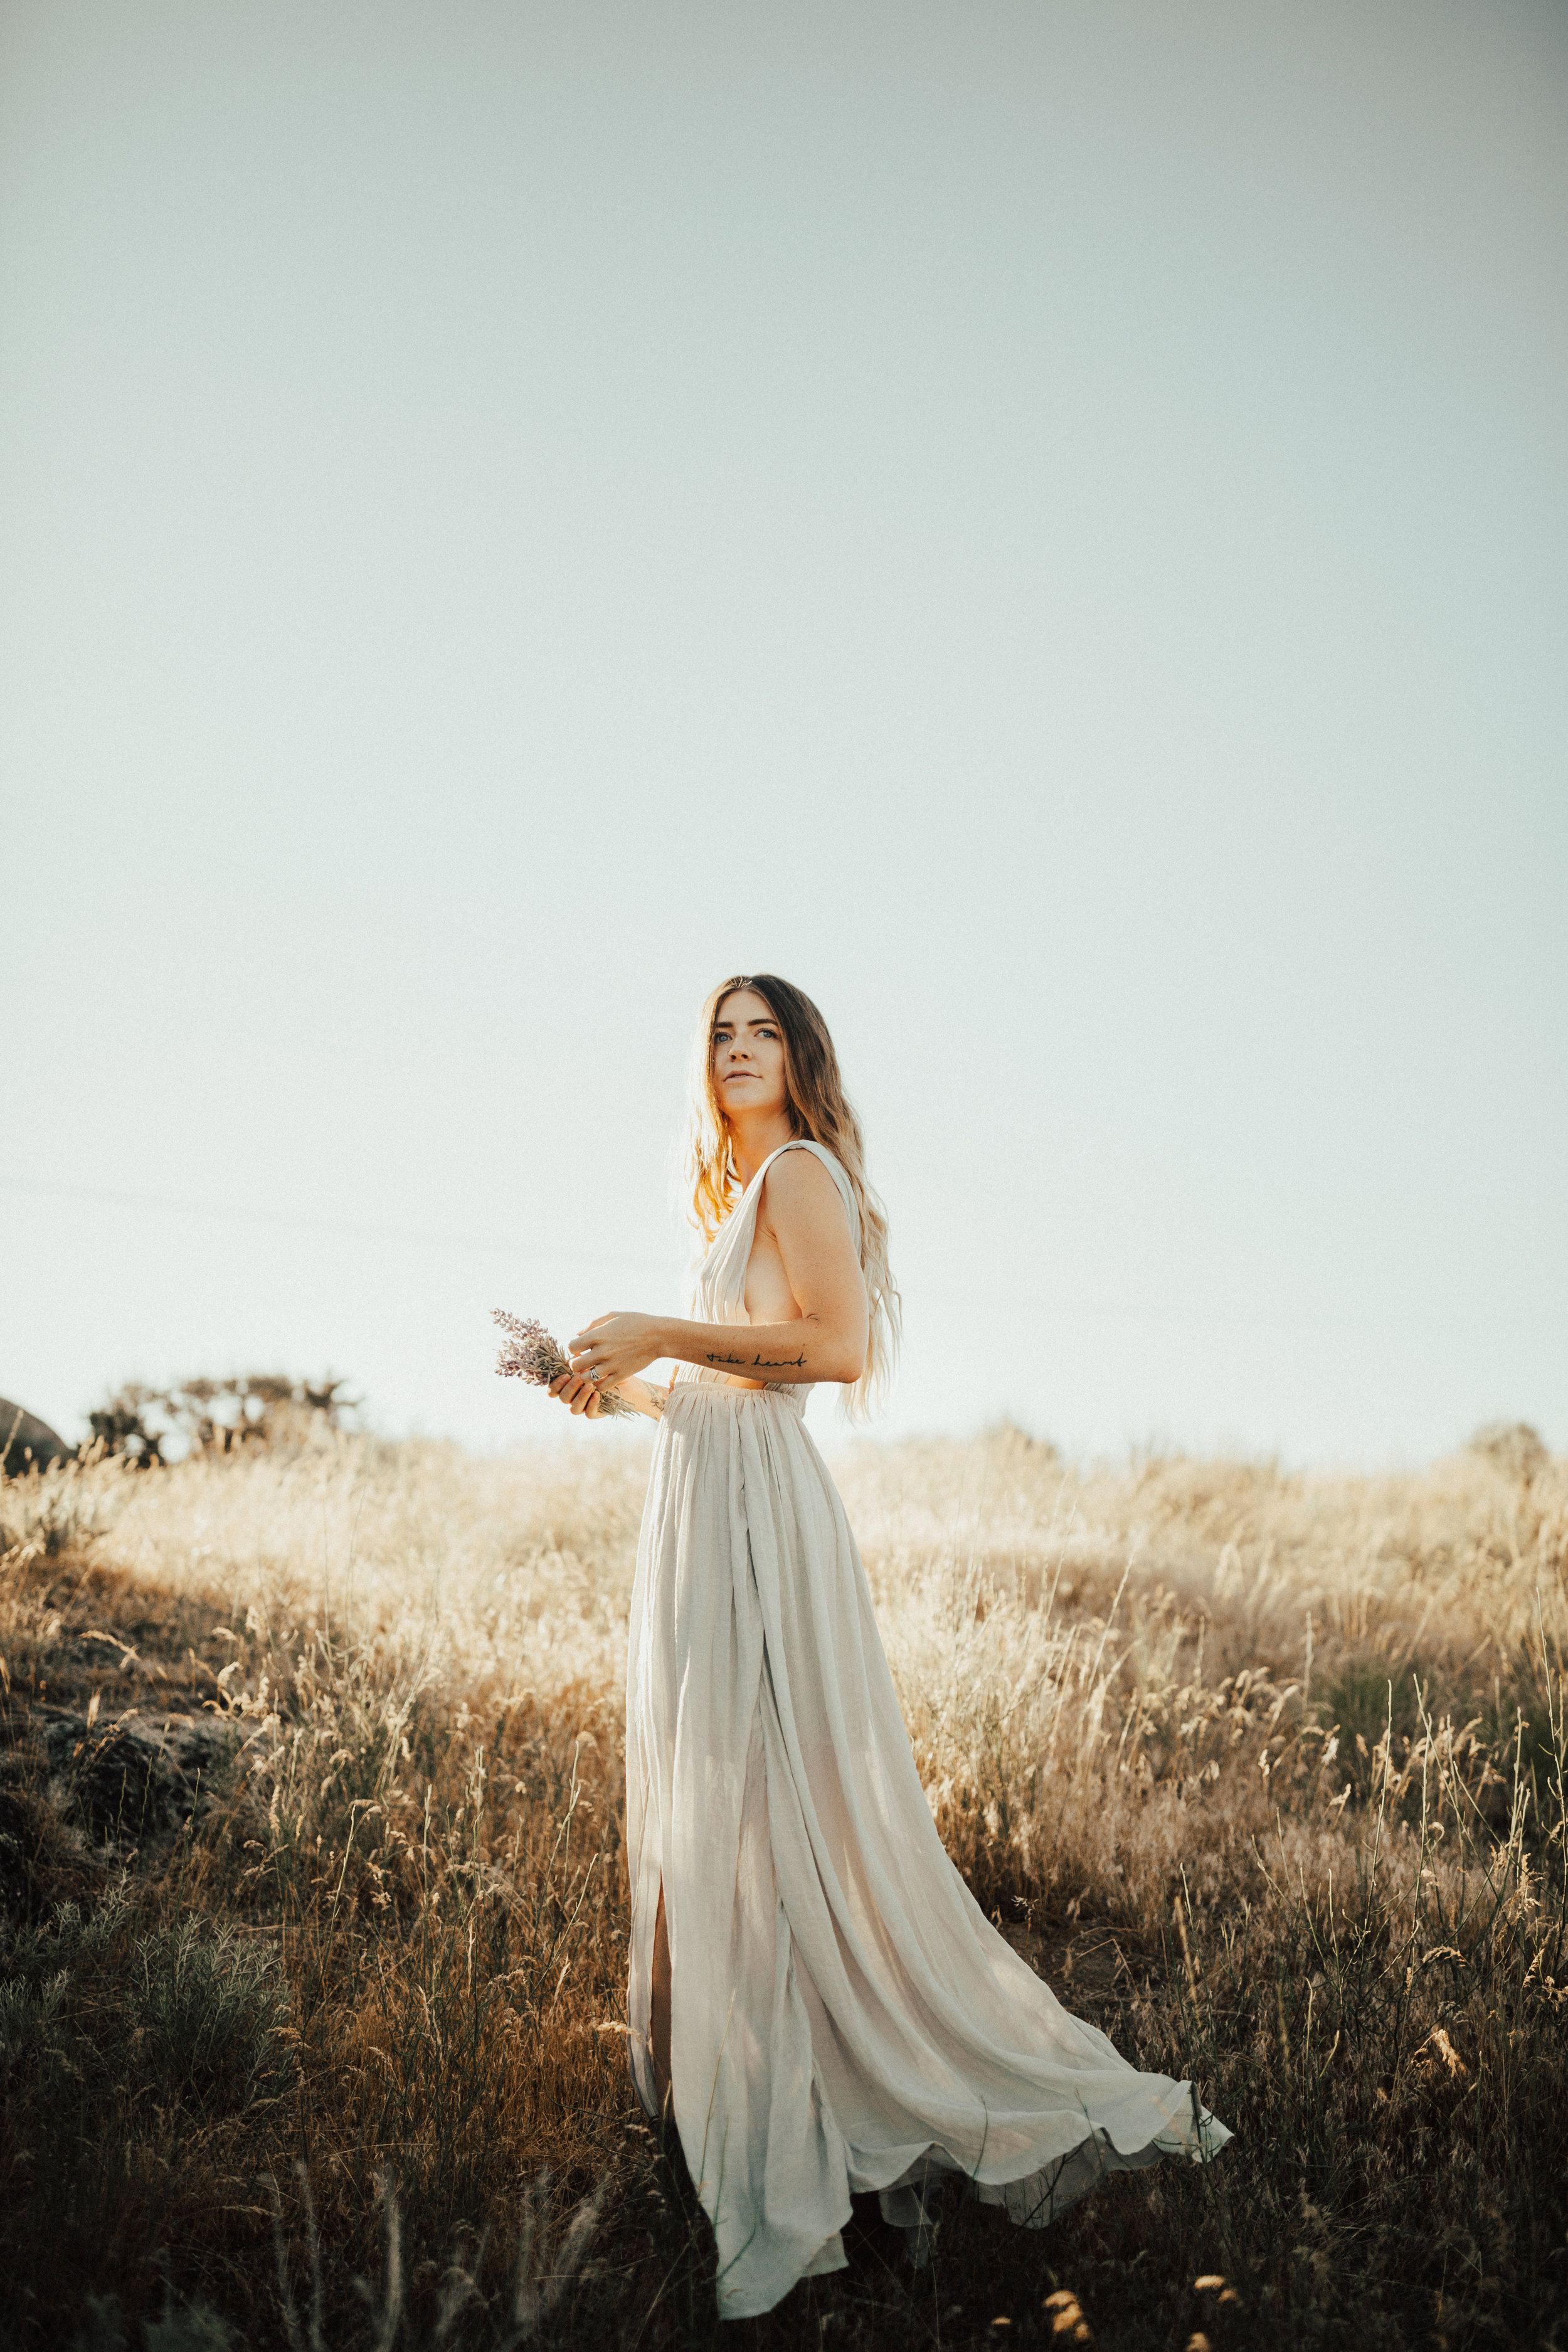 Dress by  Goldmorning